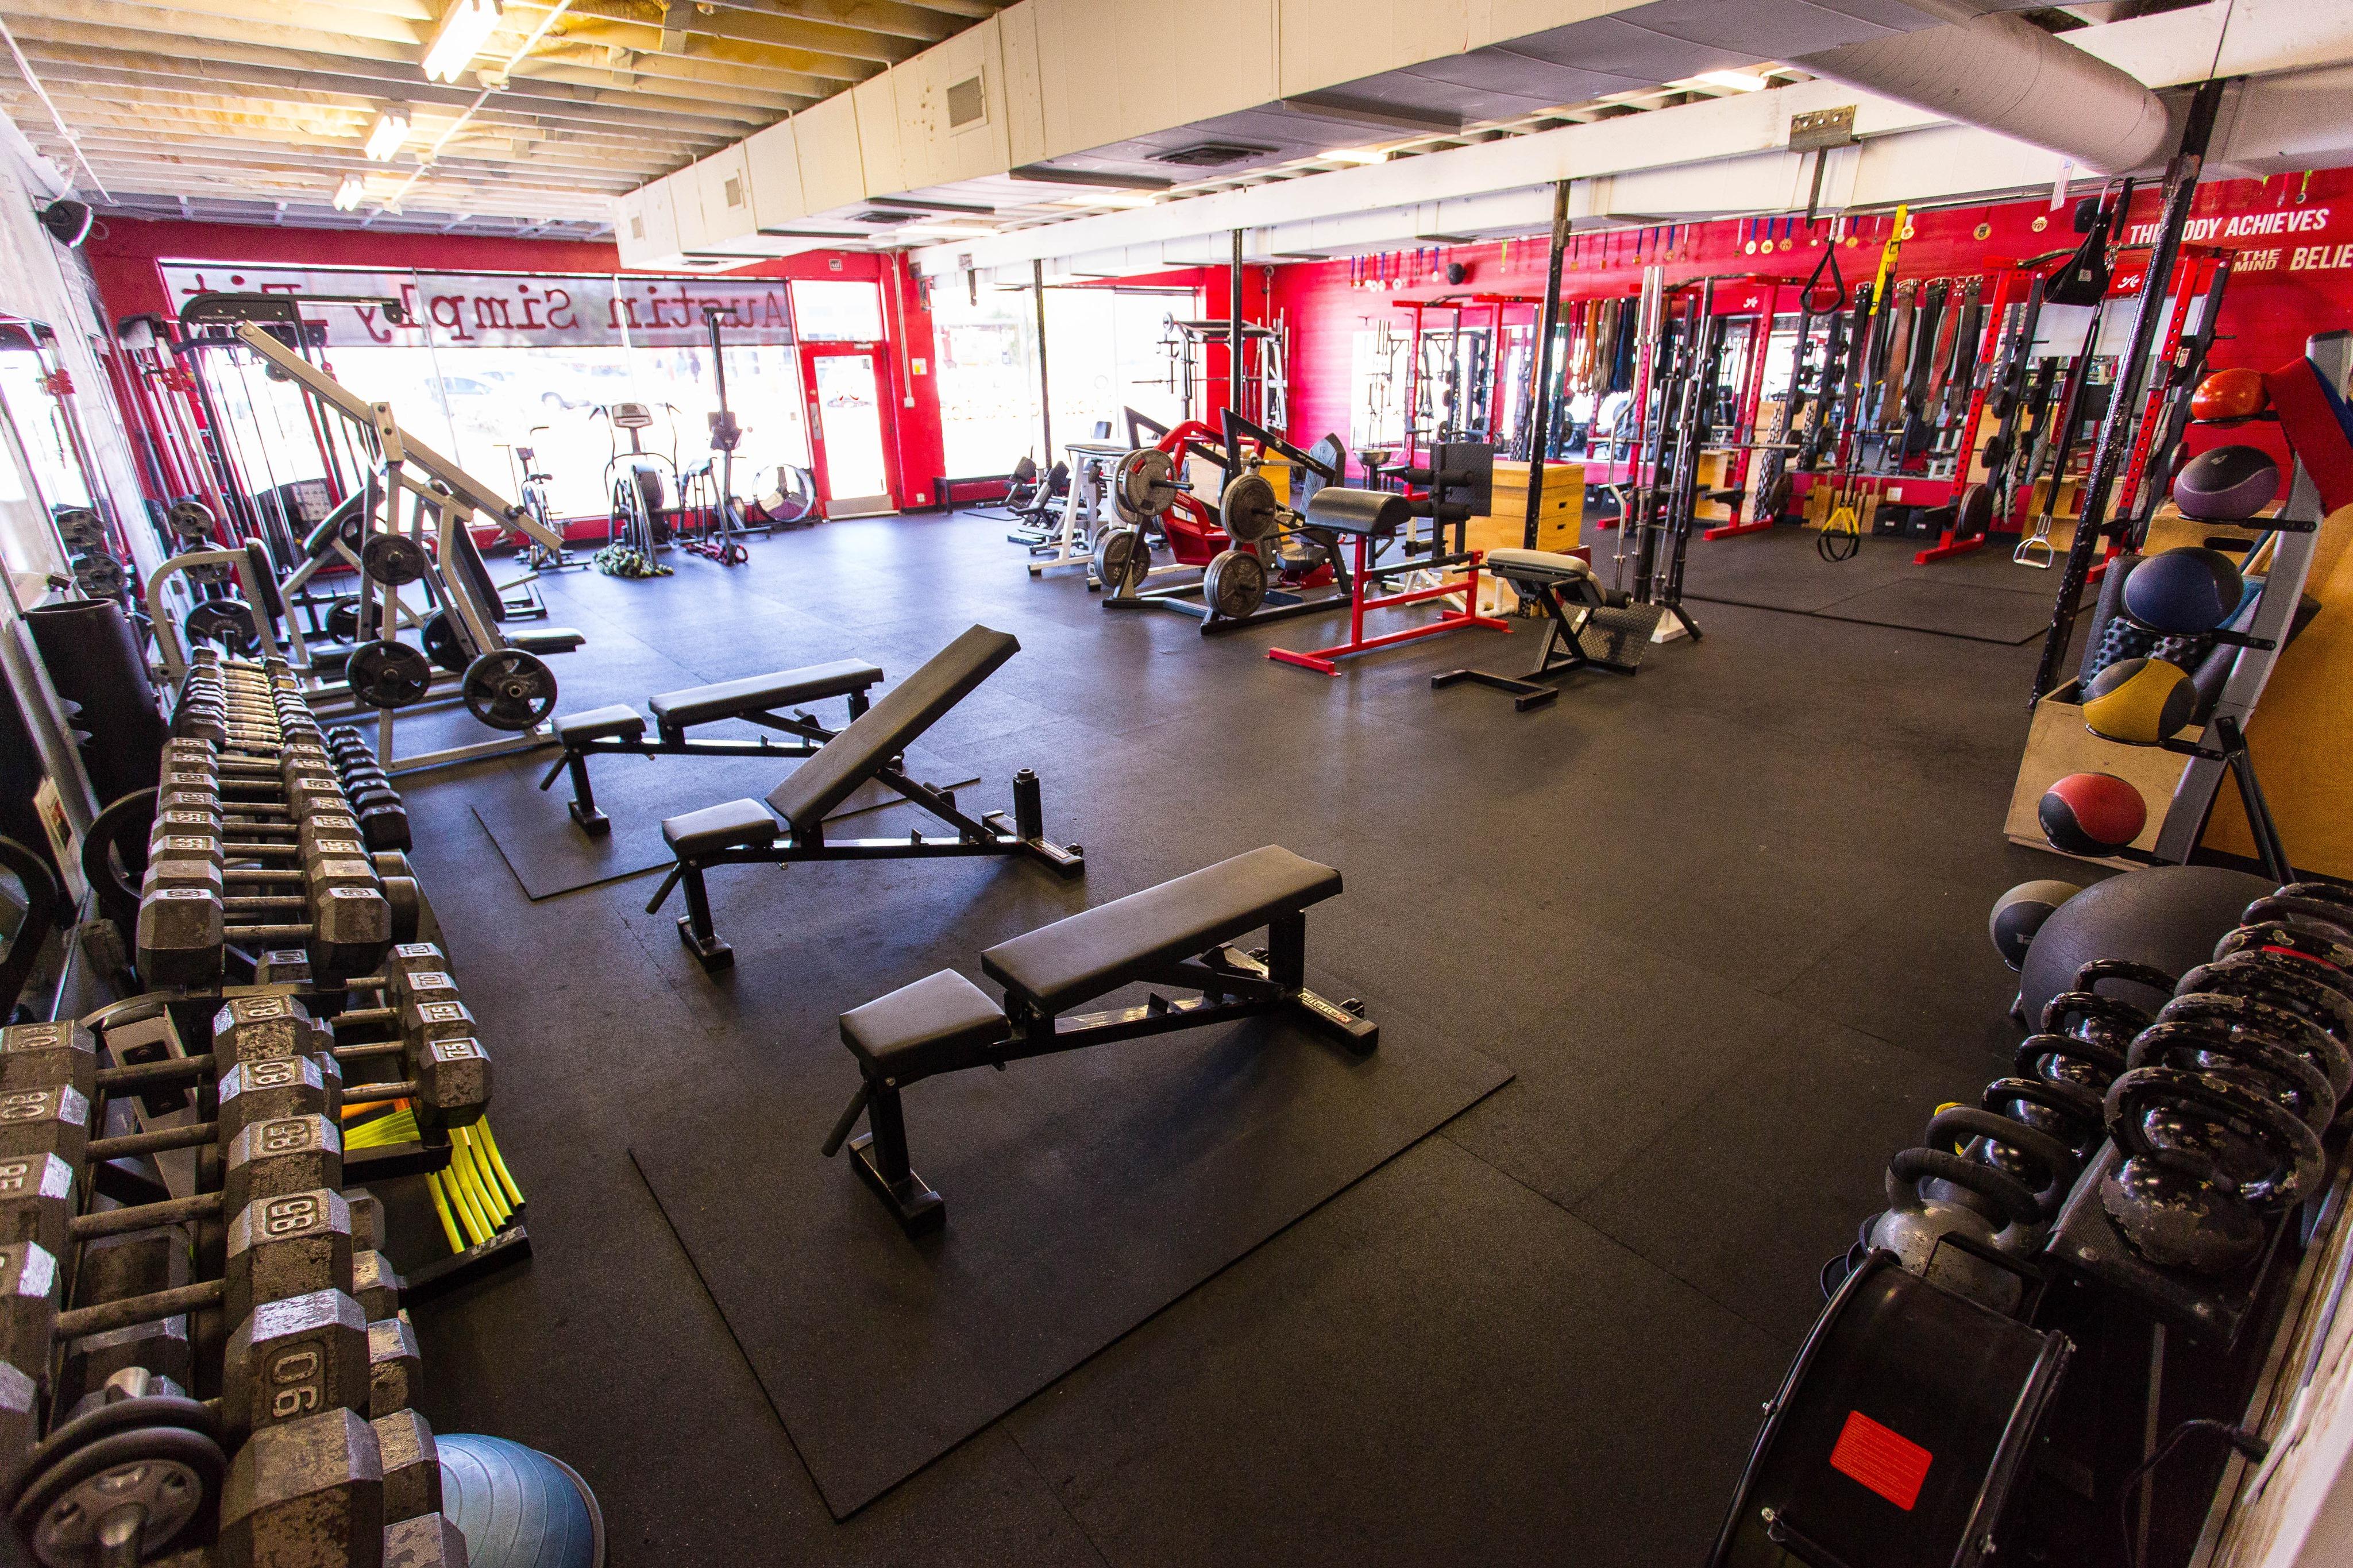 Strength training equipment at Austin Simply Fit personal training studio on Burnet Rd